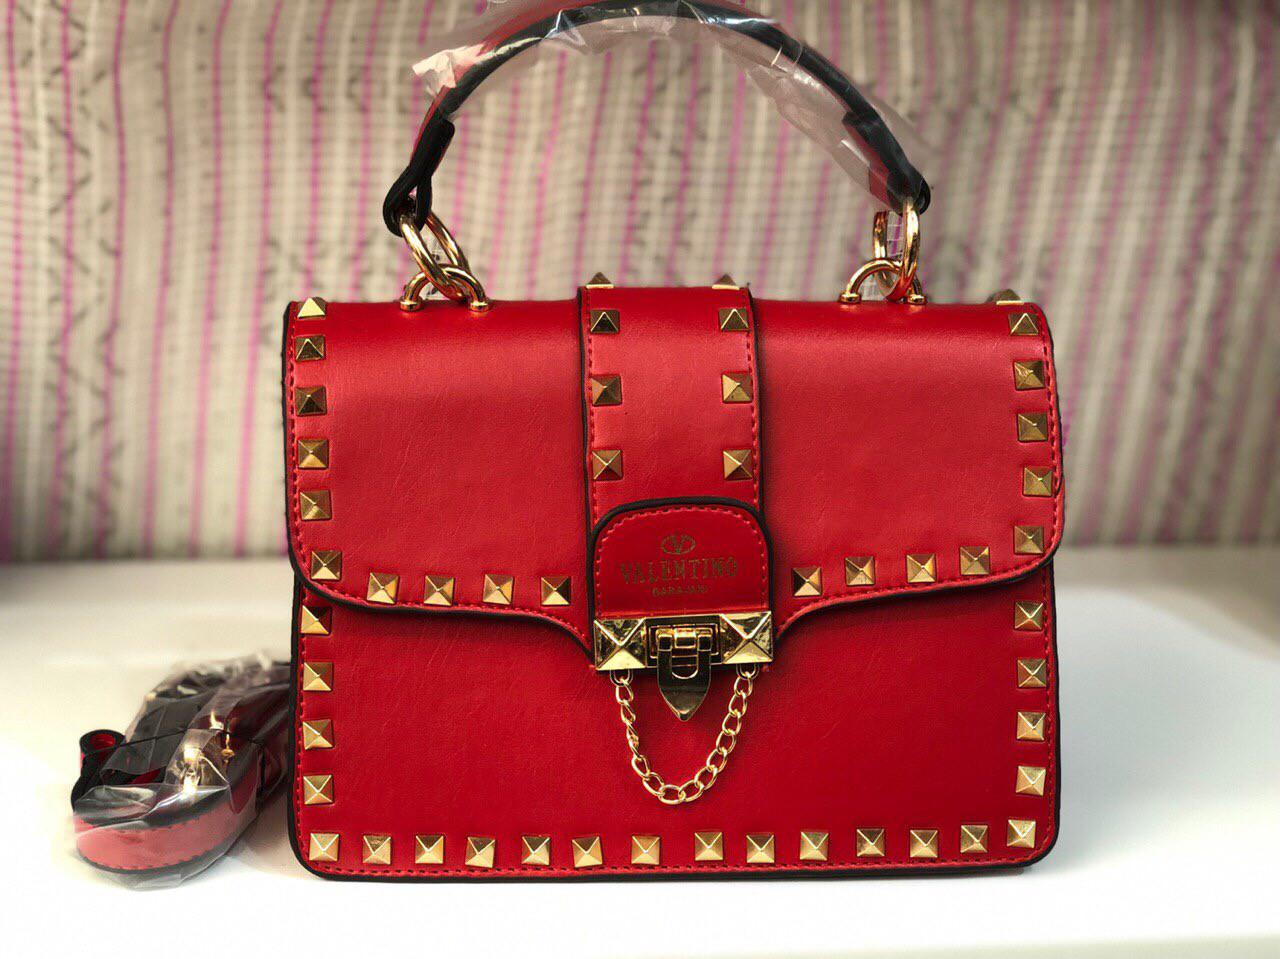 Сумка женская клатч Valentino (реплика люкс) mini red